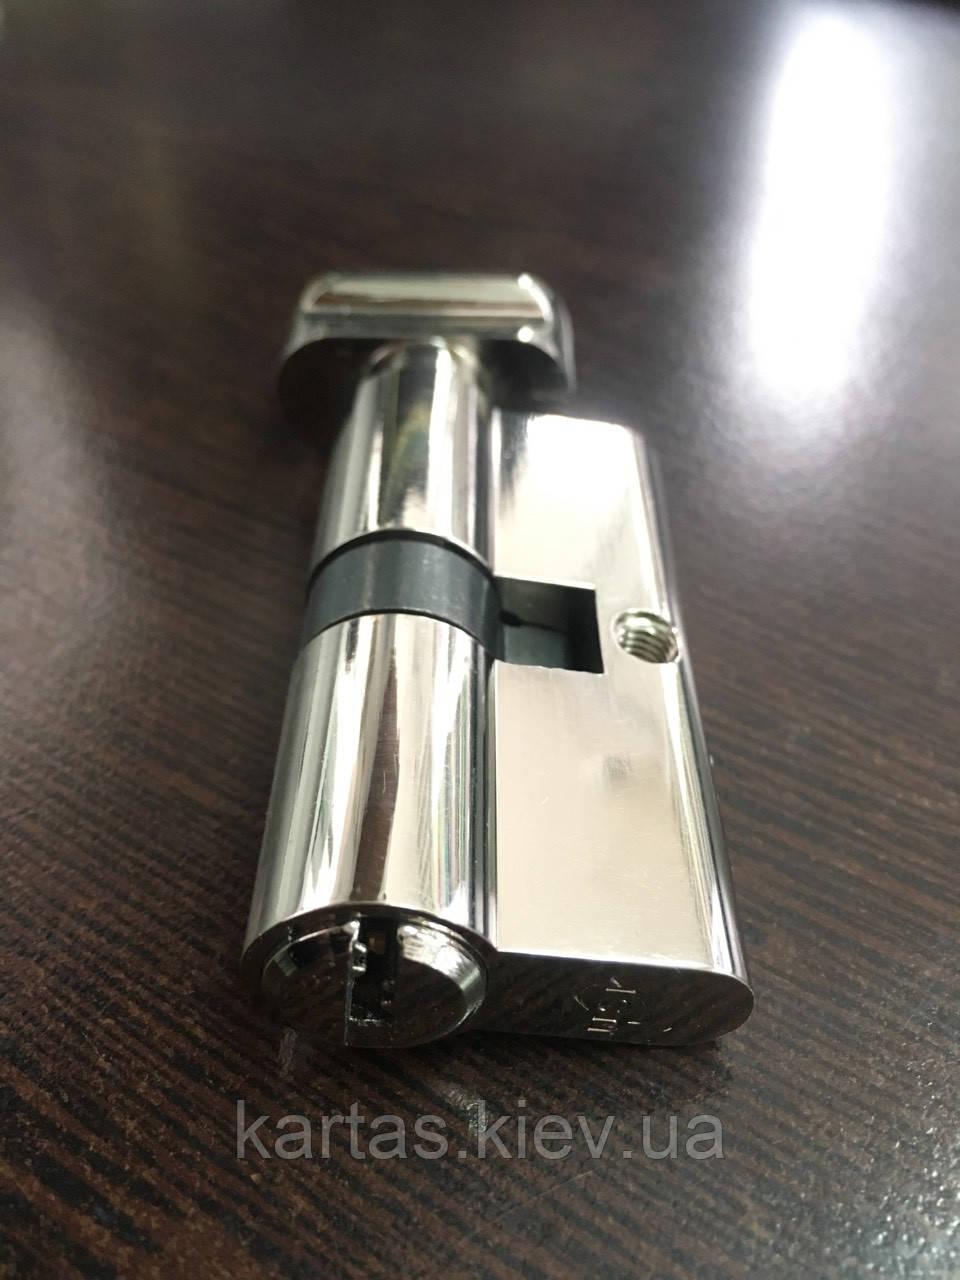 Цилиндр. механизм USK 60 ( 30*30 ) K/T